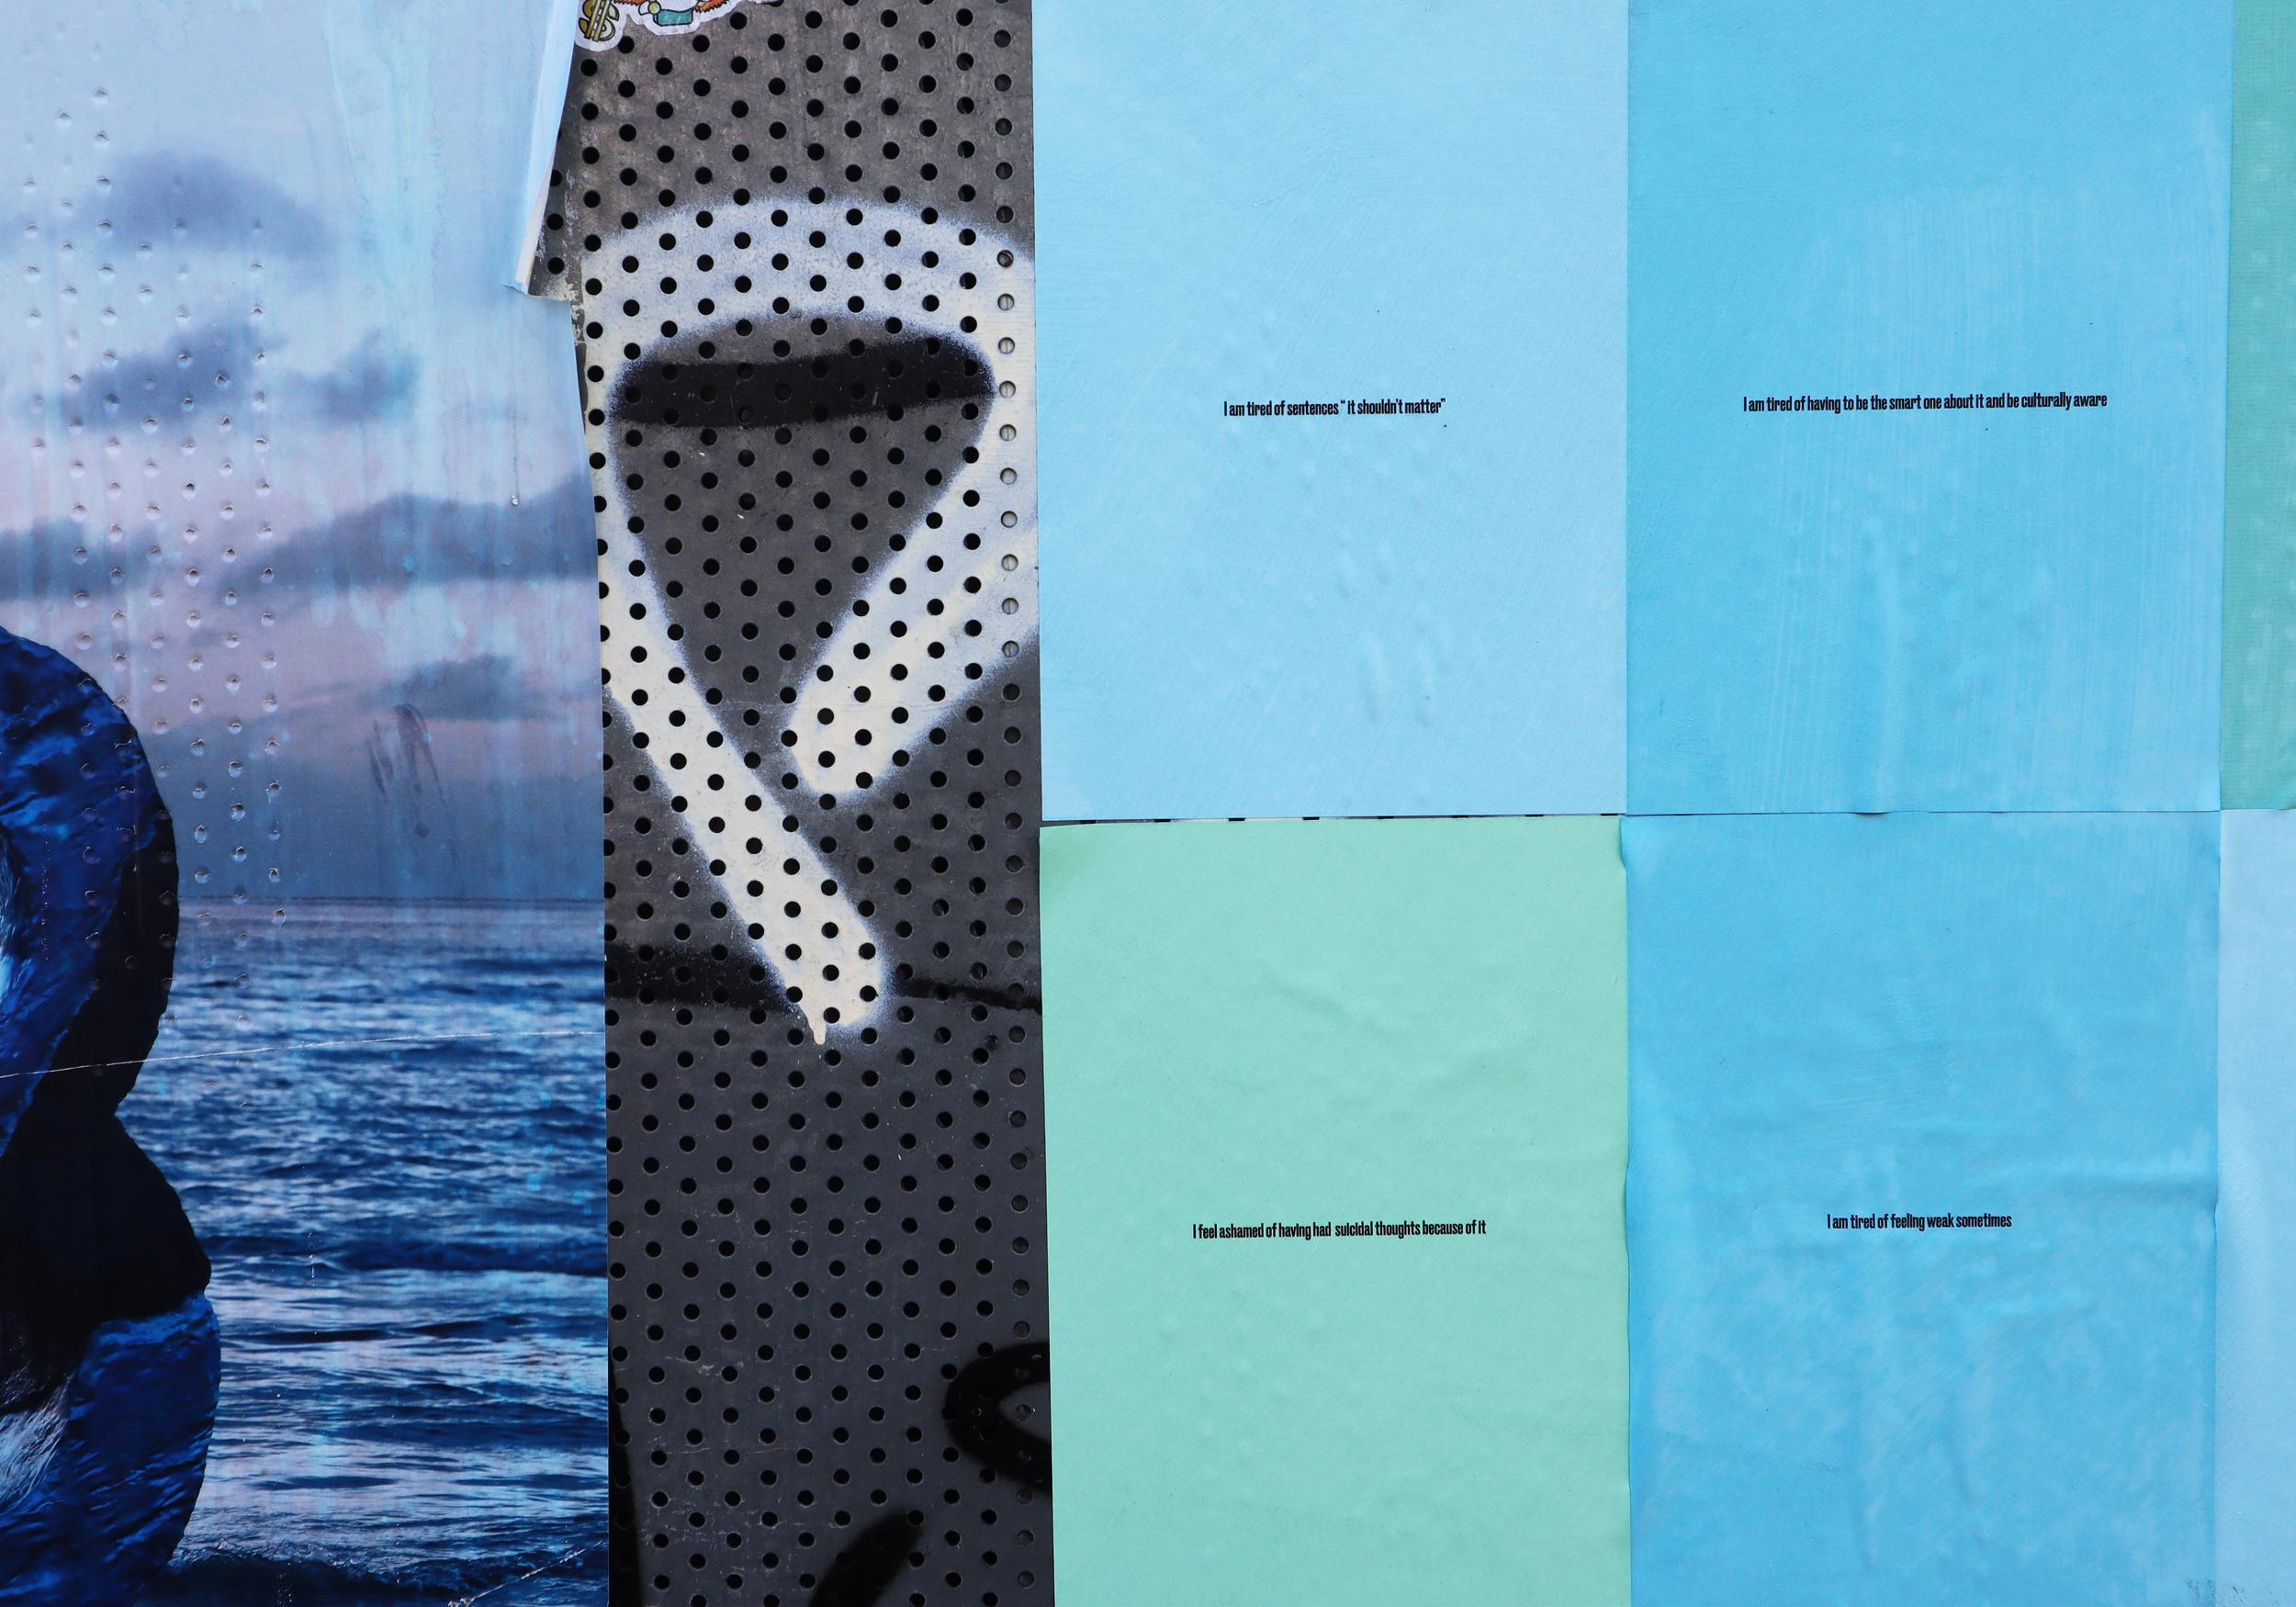 Visual Poetry Series. Public Space. (2019) (90cm x 120cm)